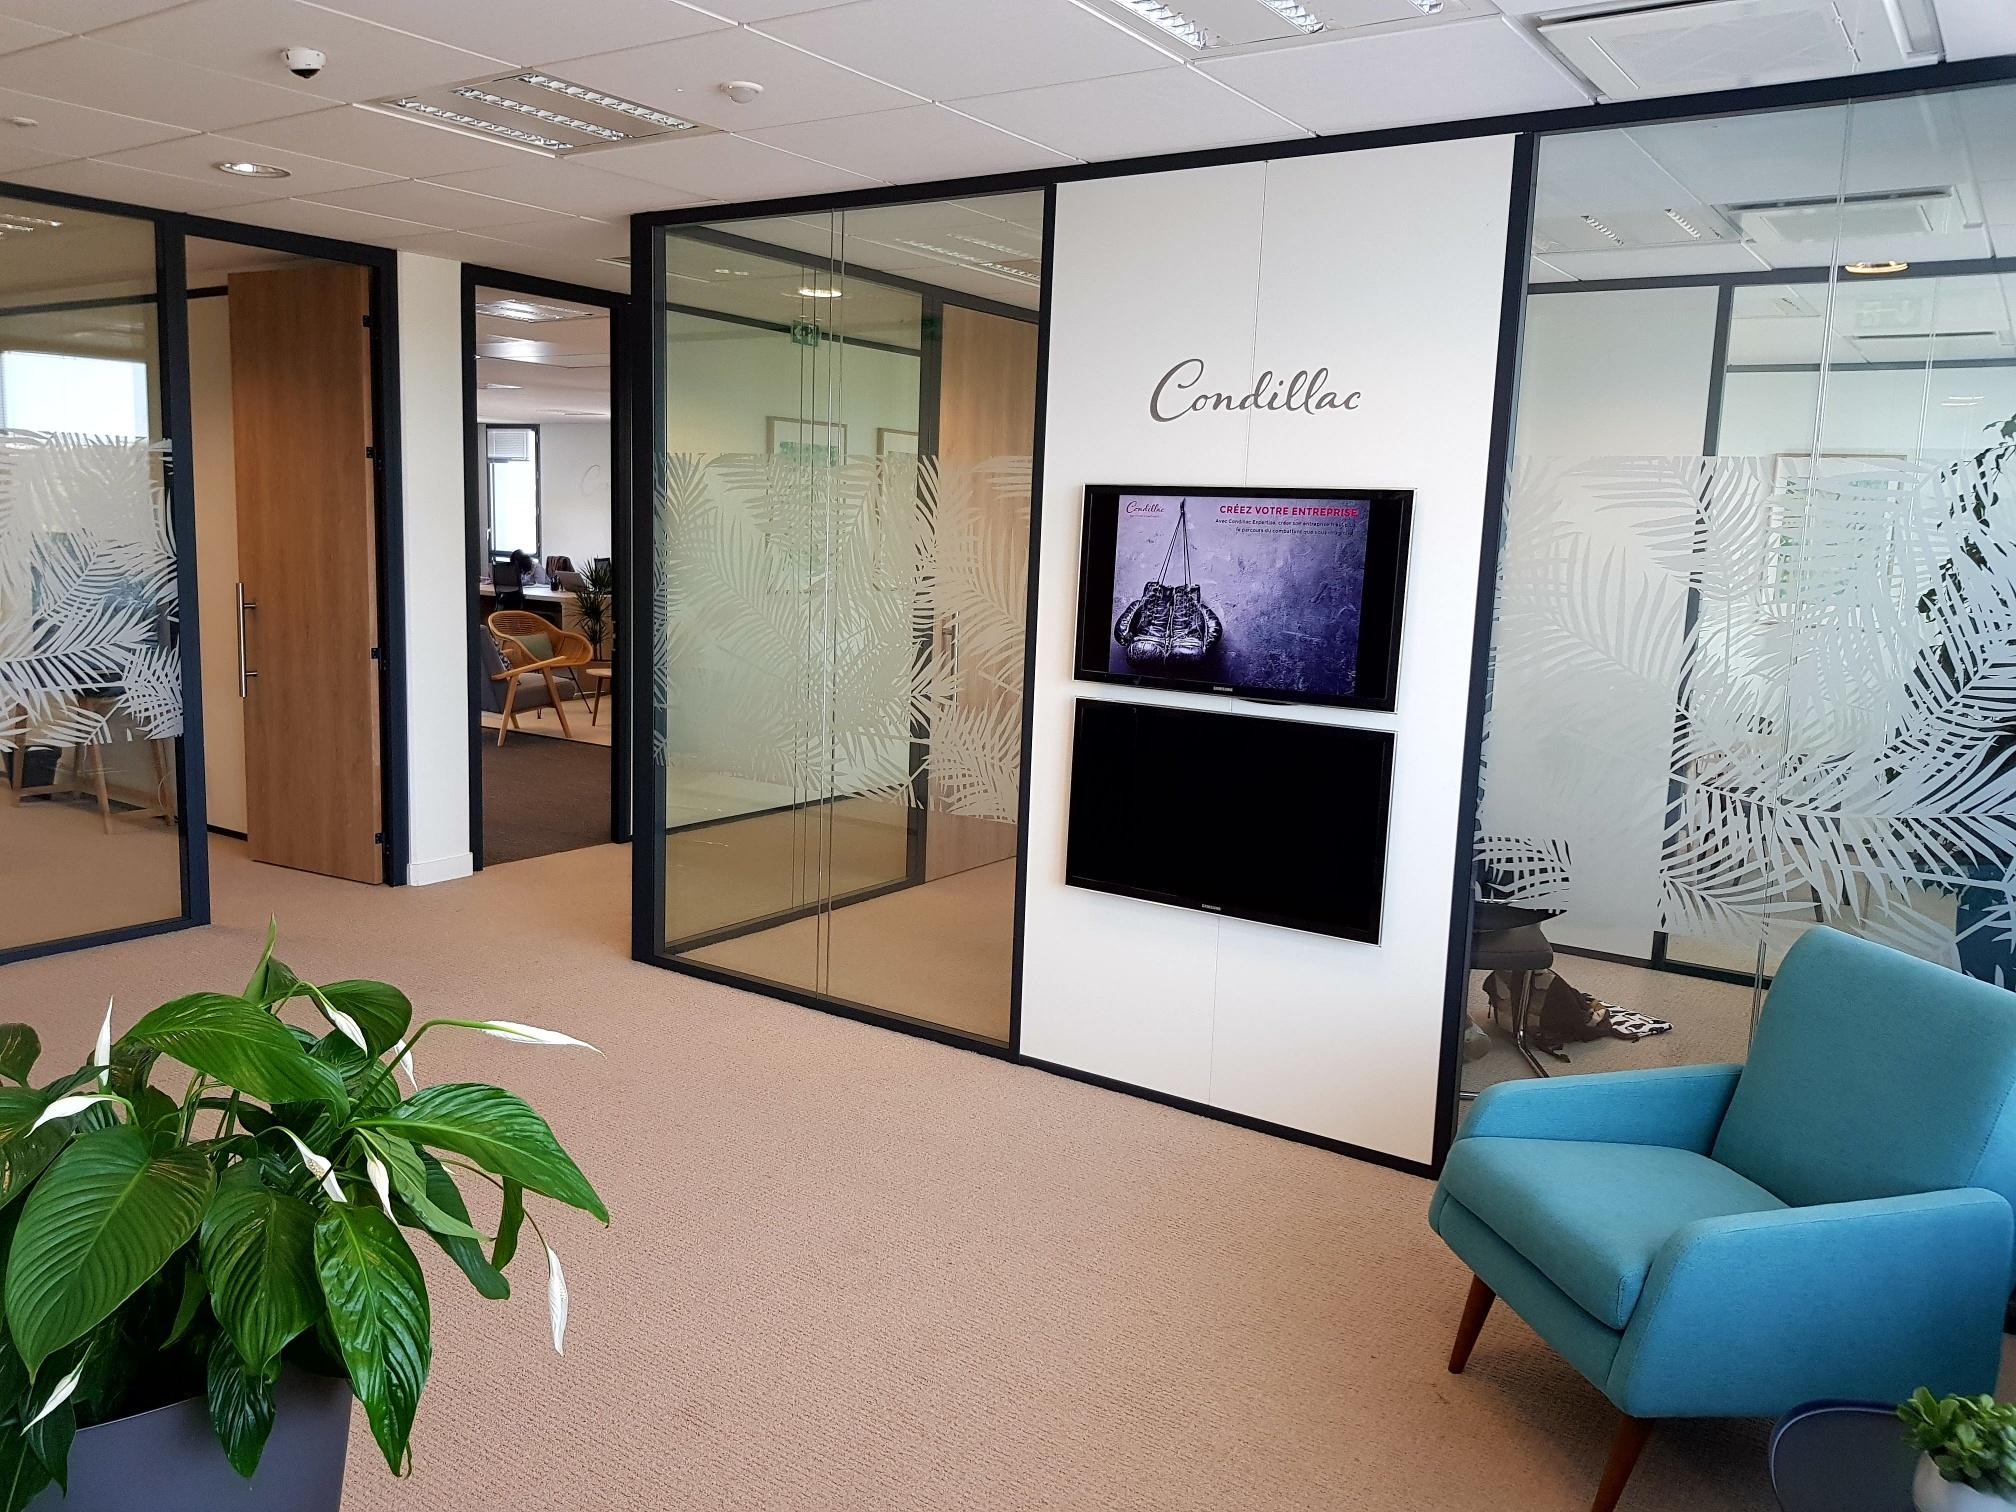 Expert comptable Bordeaux, Condillac Expertise